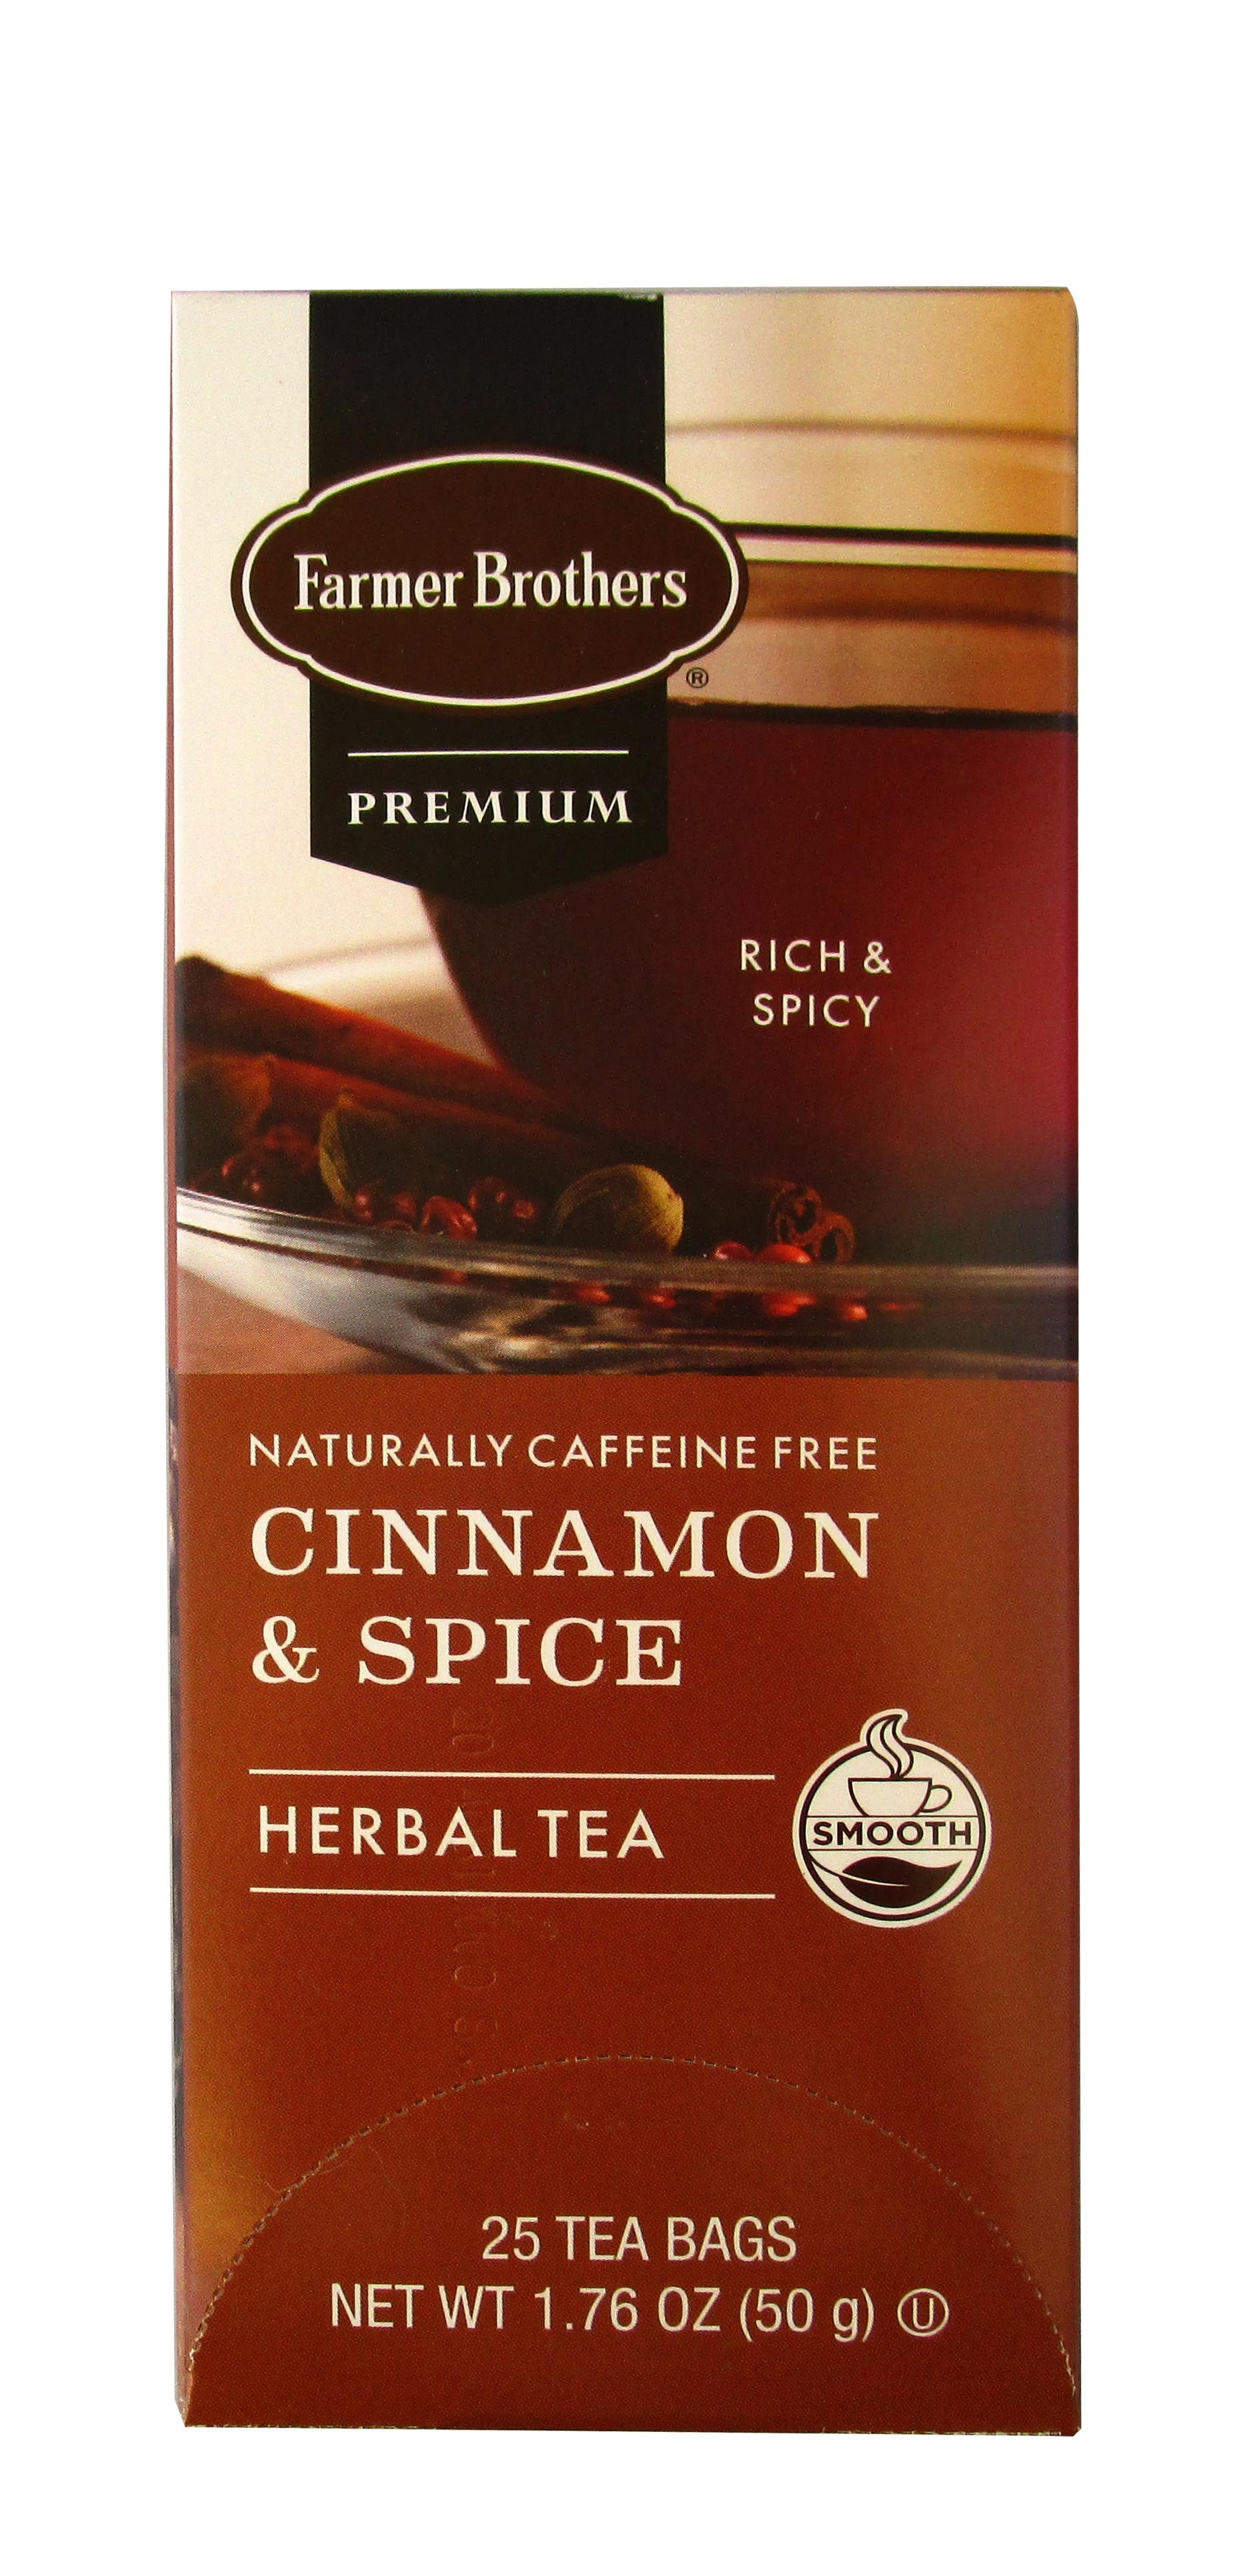 Farmer Brothers Premium Cinnamon & Spice Herbal Tea